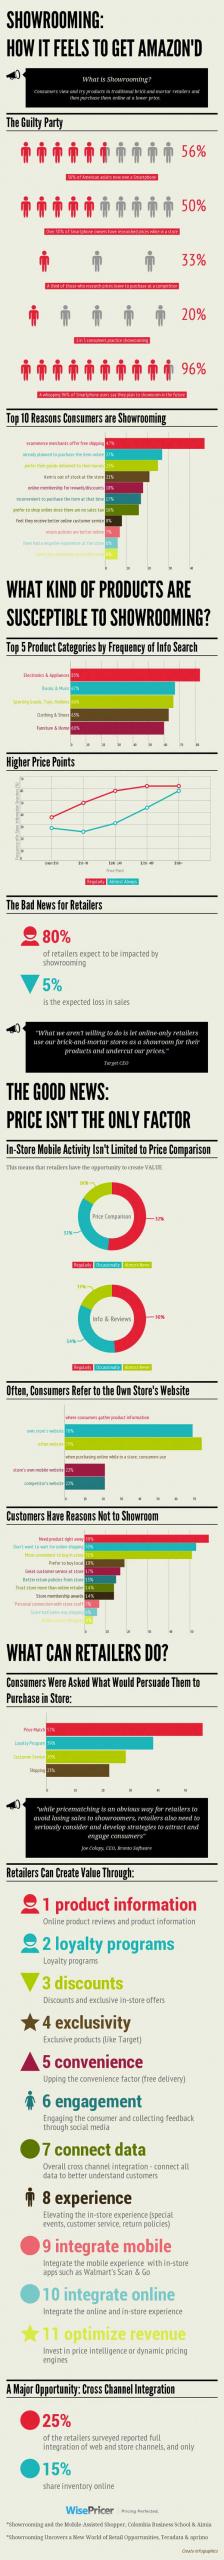 Showrooming infografía